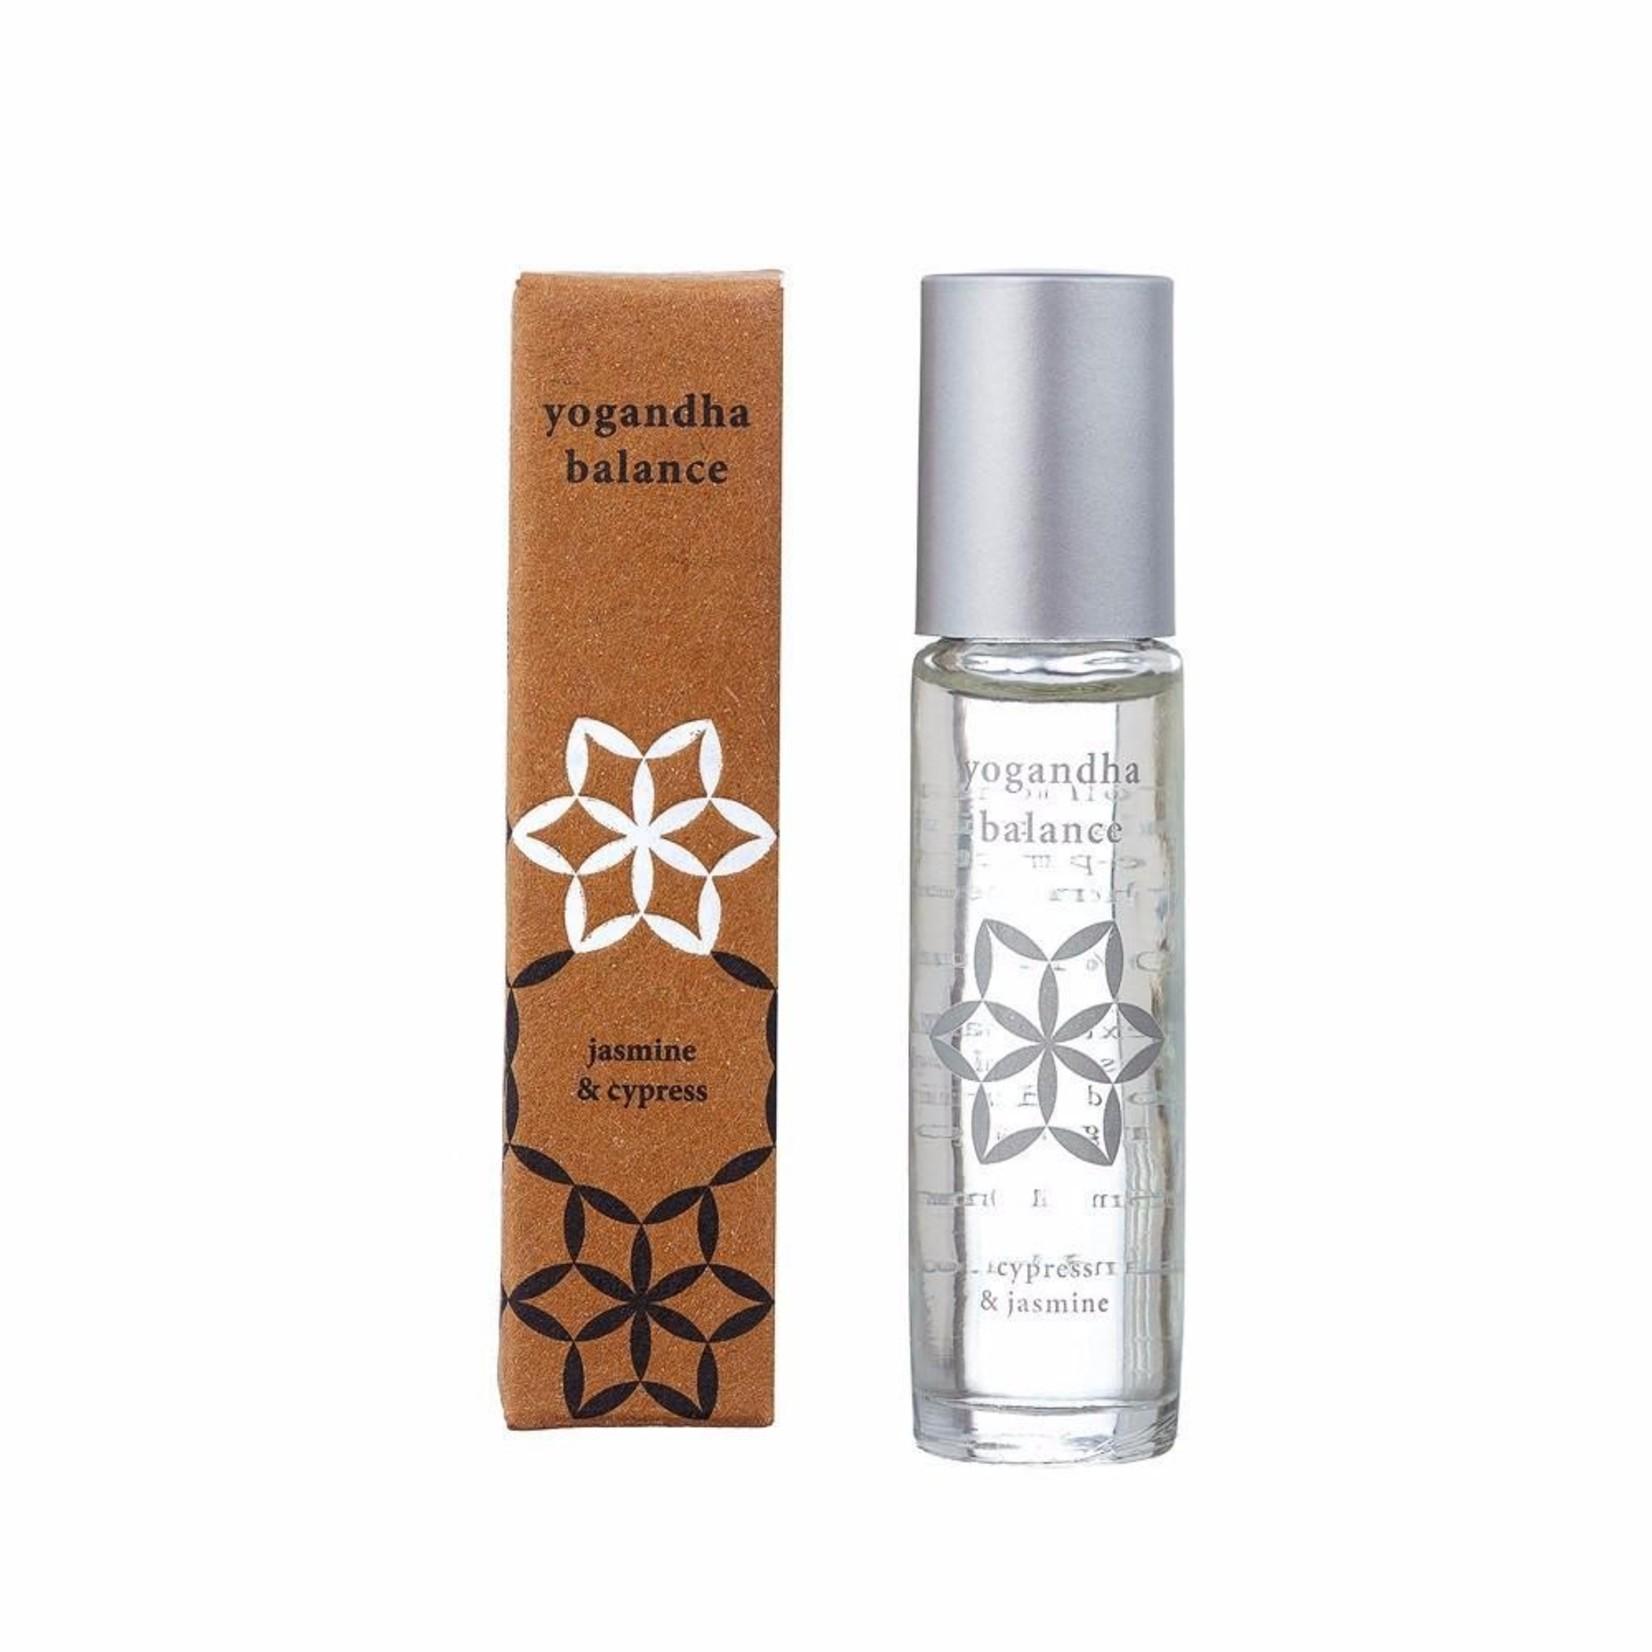 Yogandha Yogandha Balance rollerball - emotionele en hormonale balans - wellness perfume